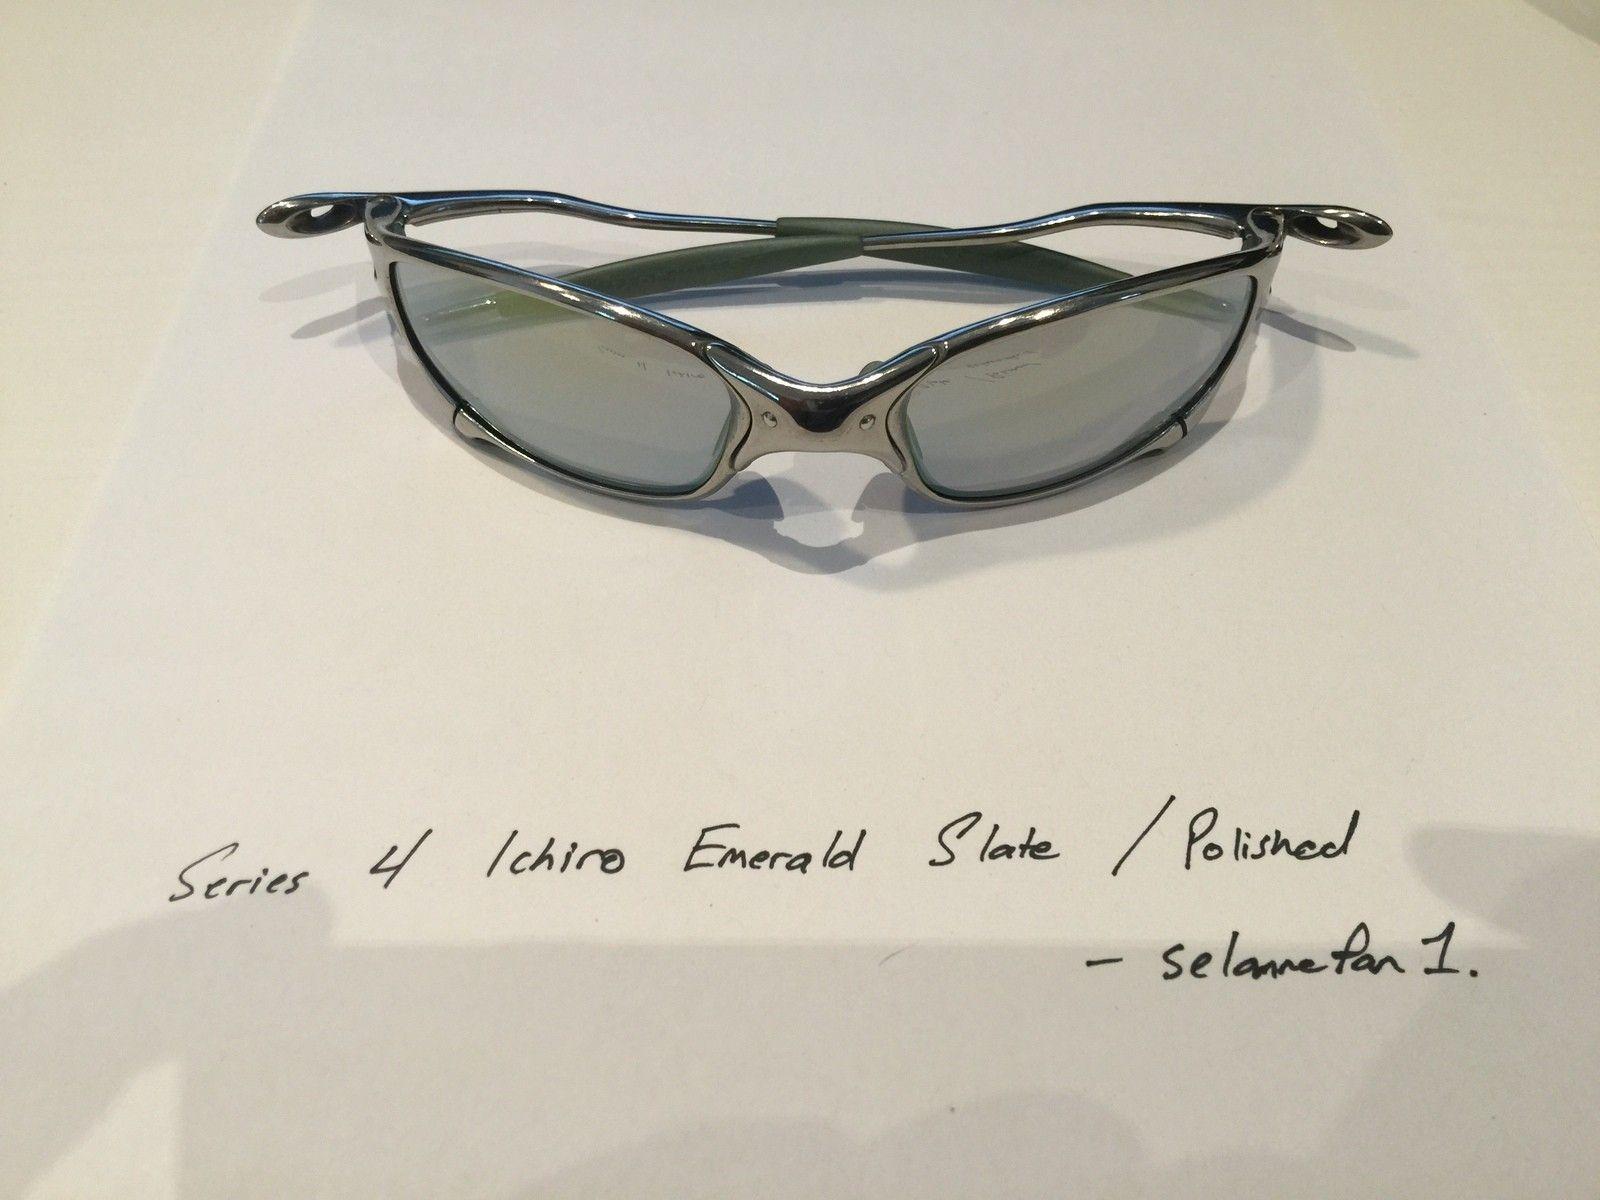 Ichiro Emerald Slate / Polished Frame Juliets (with box) - IMG_3813.JPG